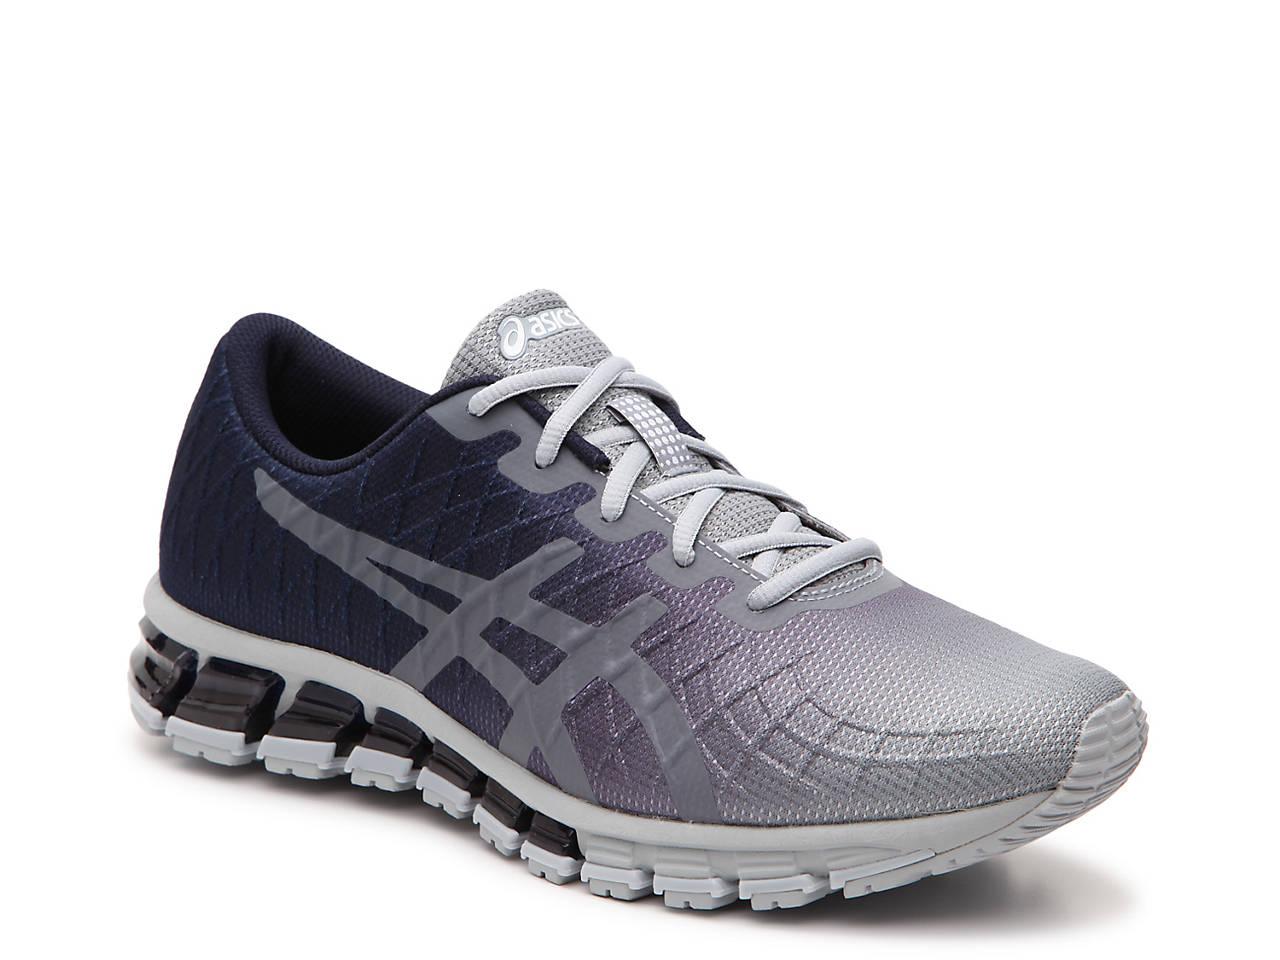 finest selection 1e596 244f7 GEL-Quantum 180 4 Running Shoe - Men's